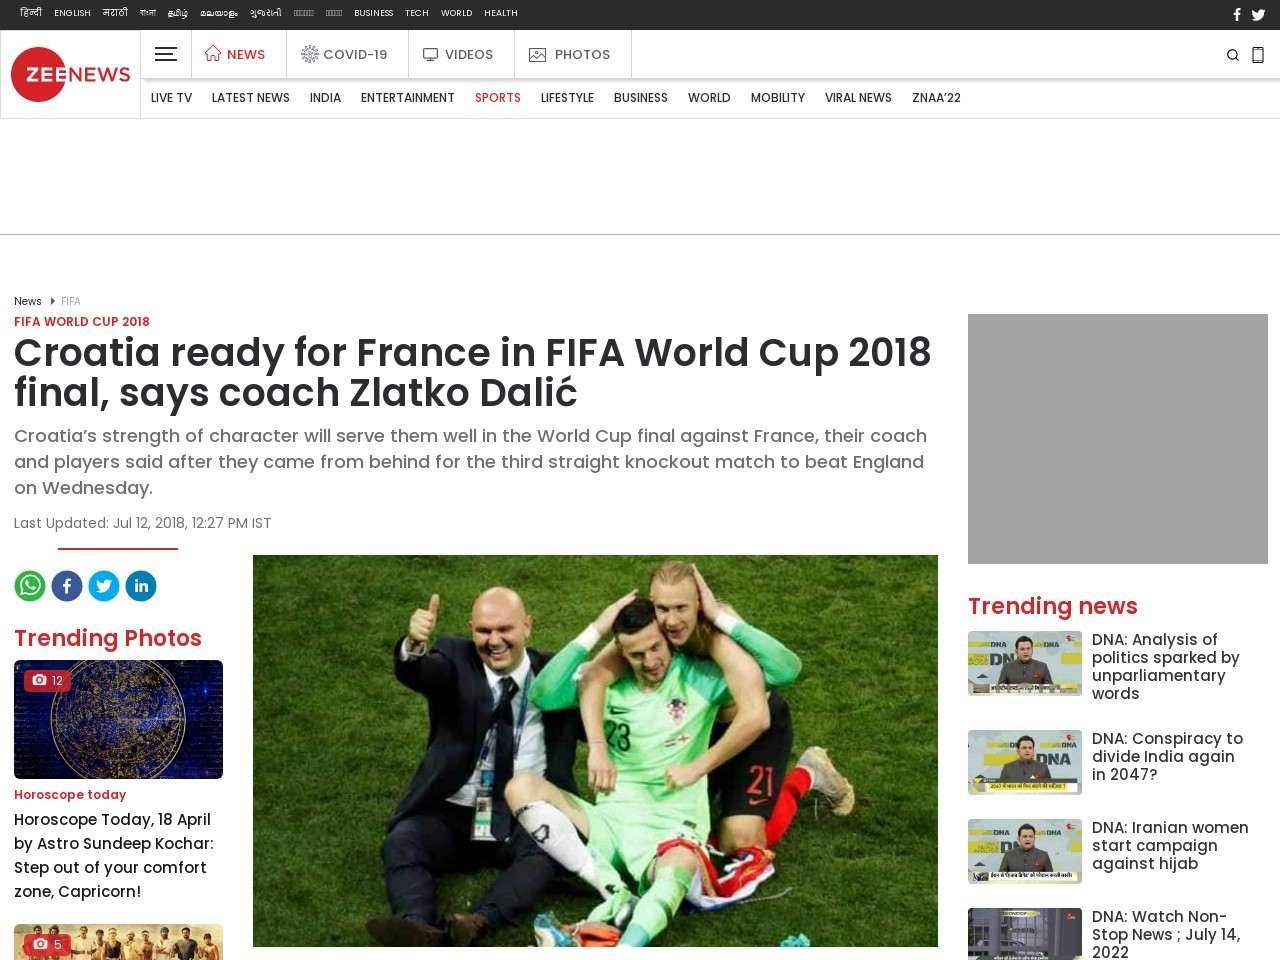 Croatia ready for France in FIFA World Cup 2018 final, says coach Zlatko Dalić